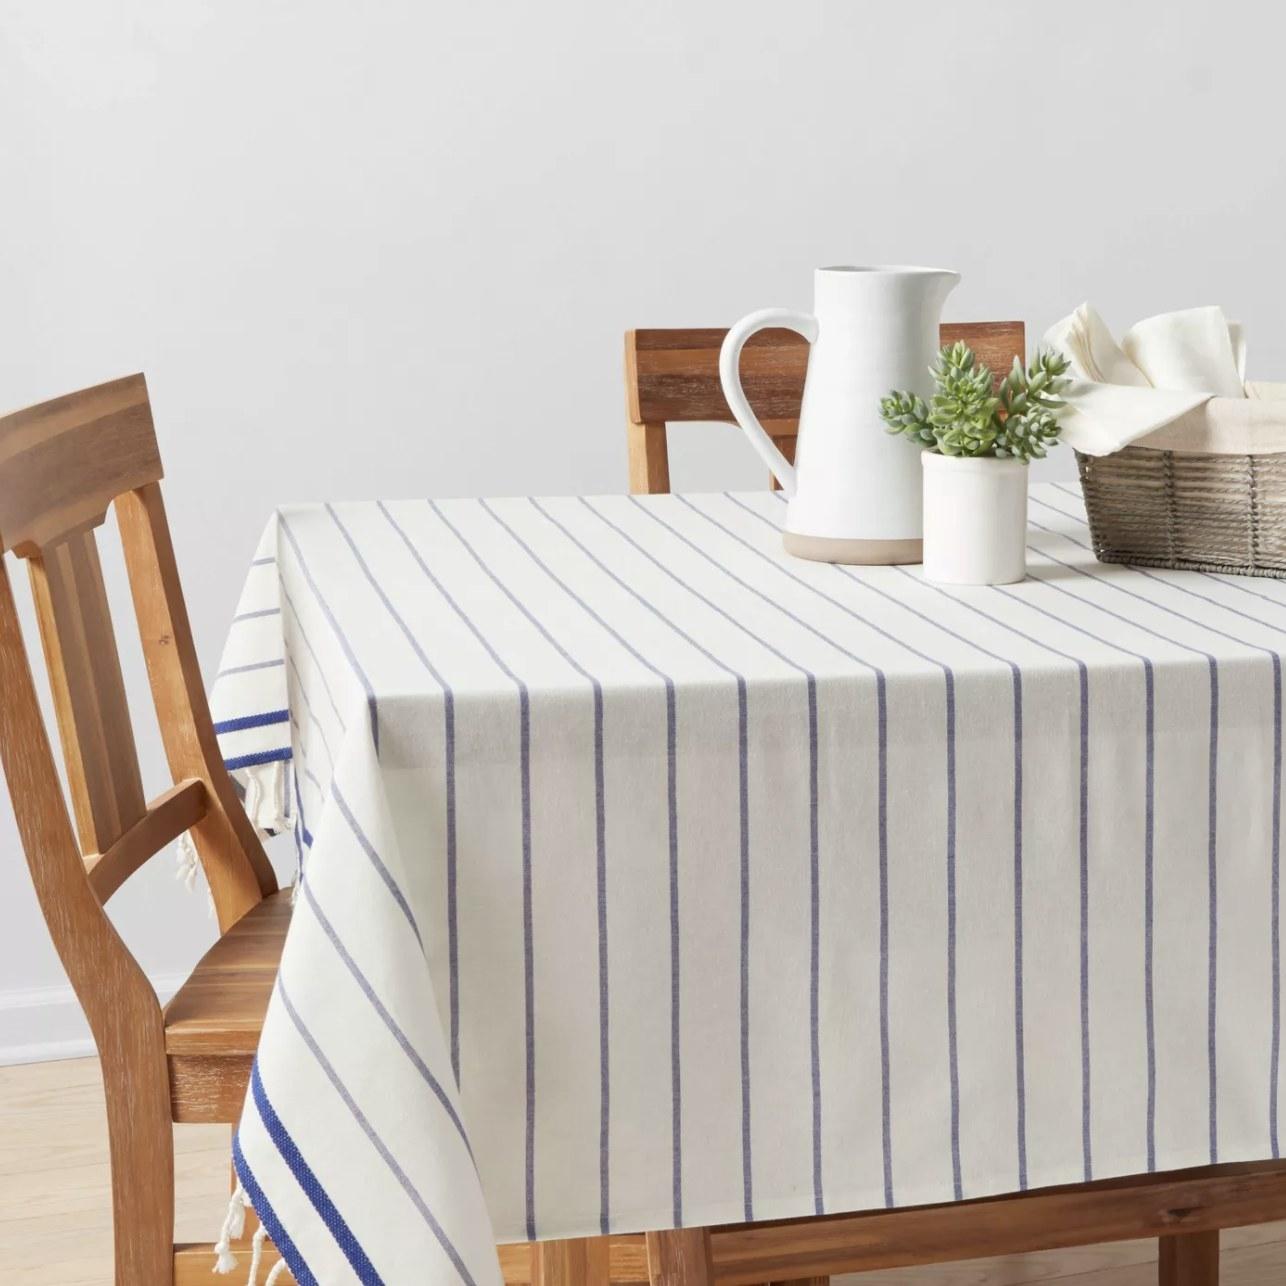 Table cloth on table